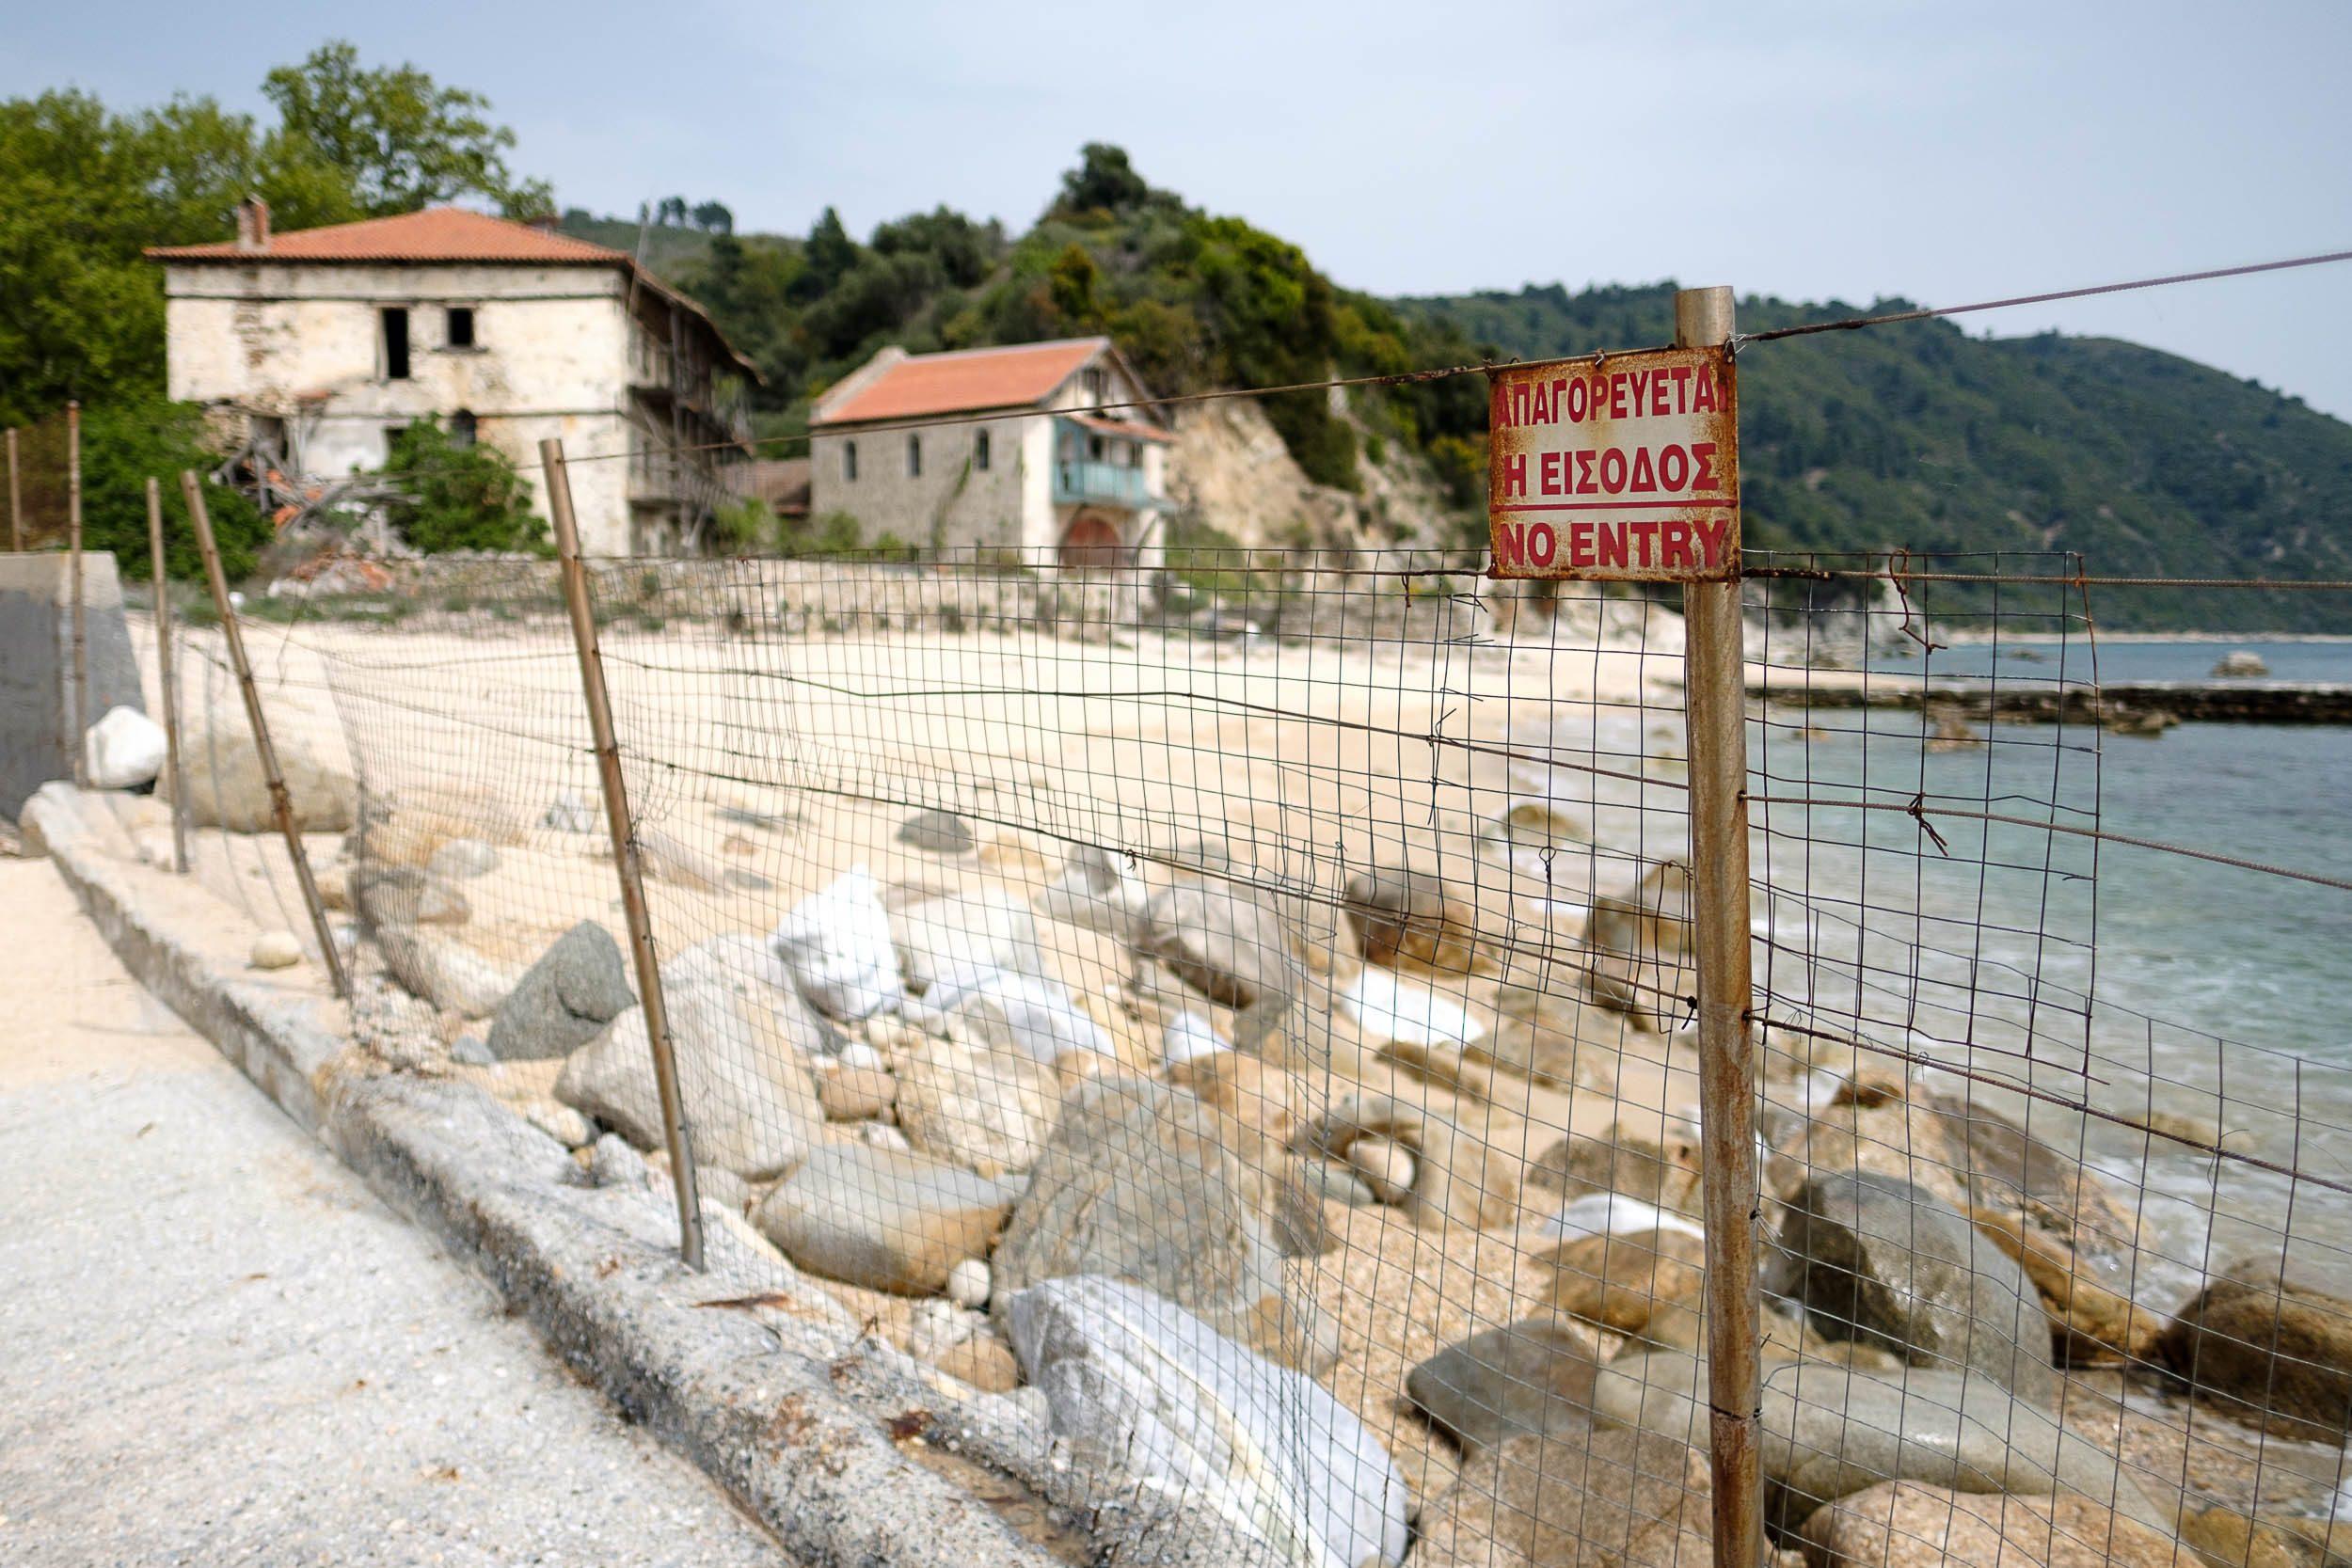 Grenzzaun Mönchsrepublik Athos, Griechenland, Ägäis